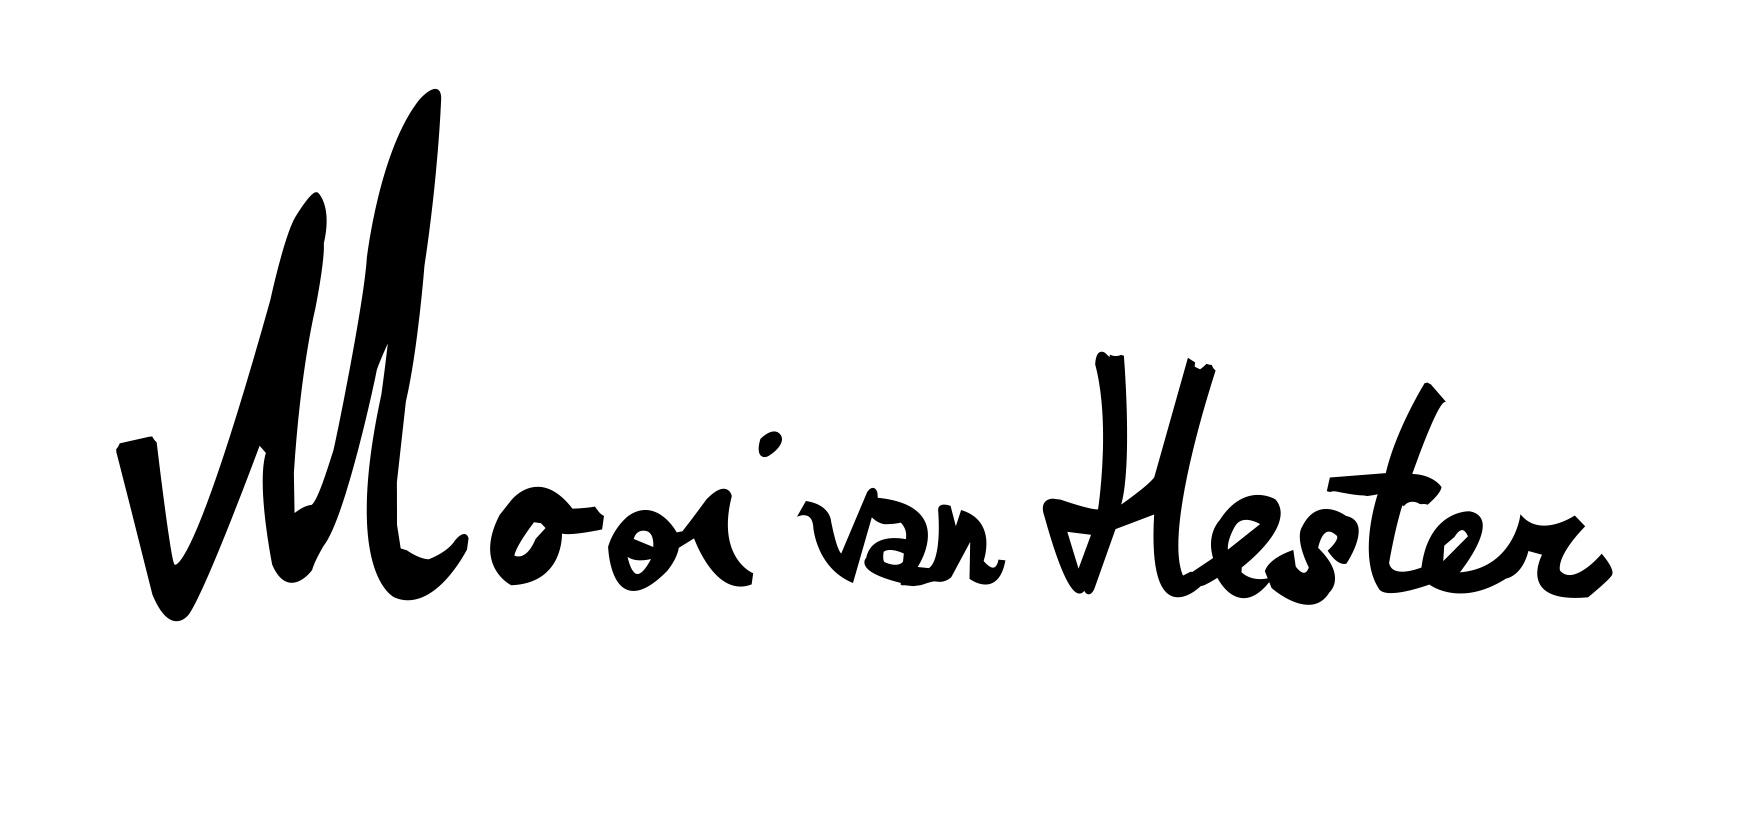 MooivanHester.nl